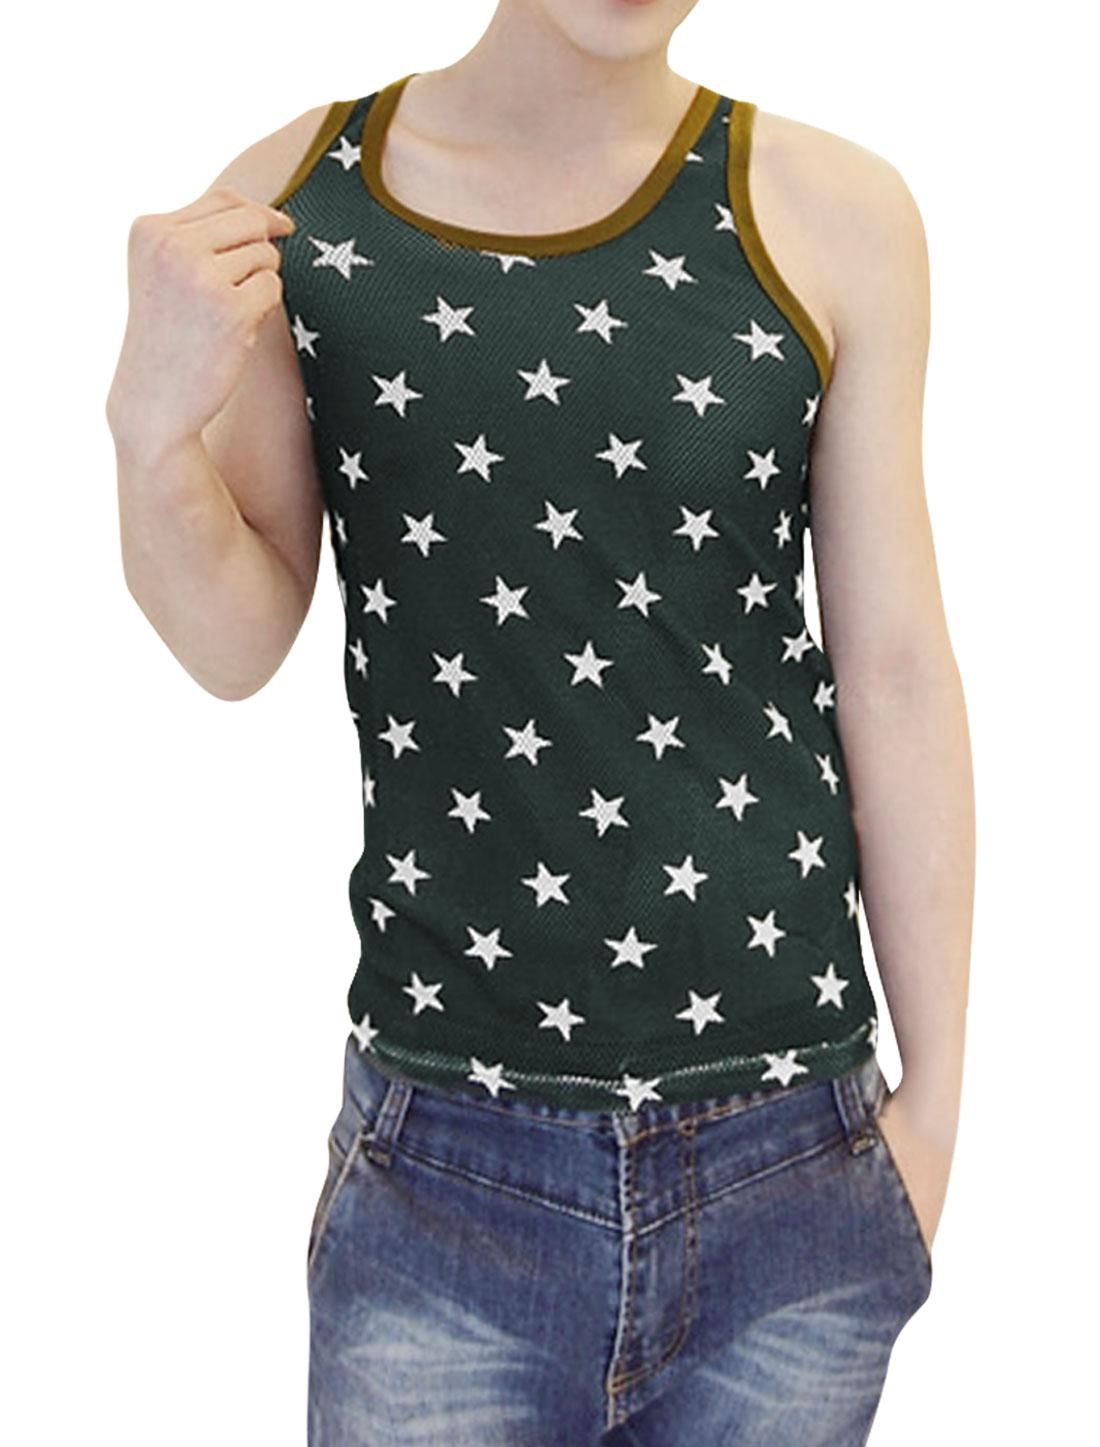 Men Stars Pattern U Neck Sleeveless Design Pullover Tank Top S Olive Green